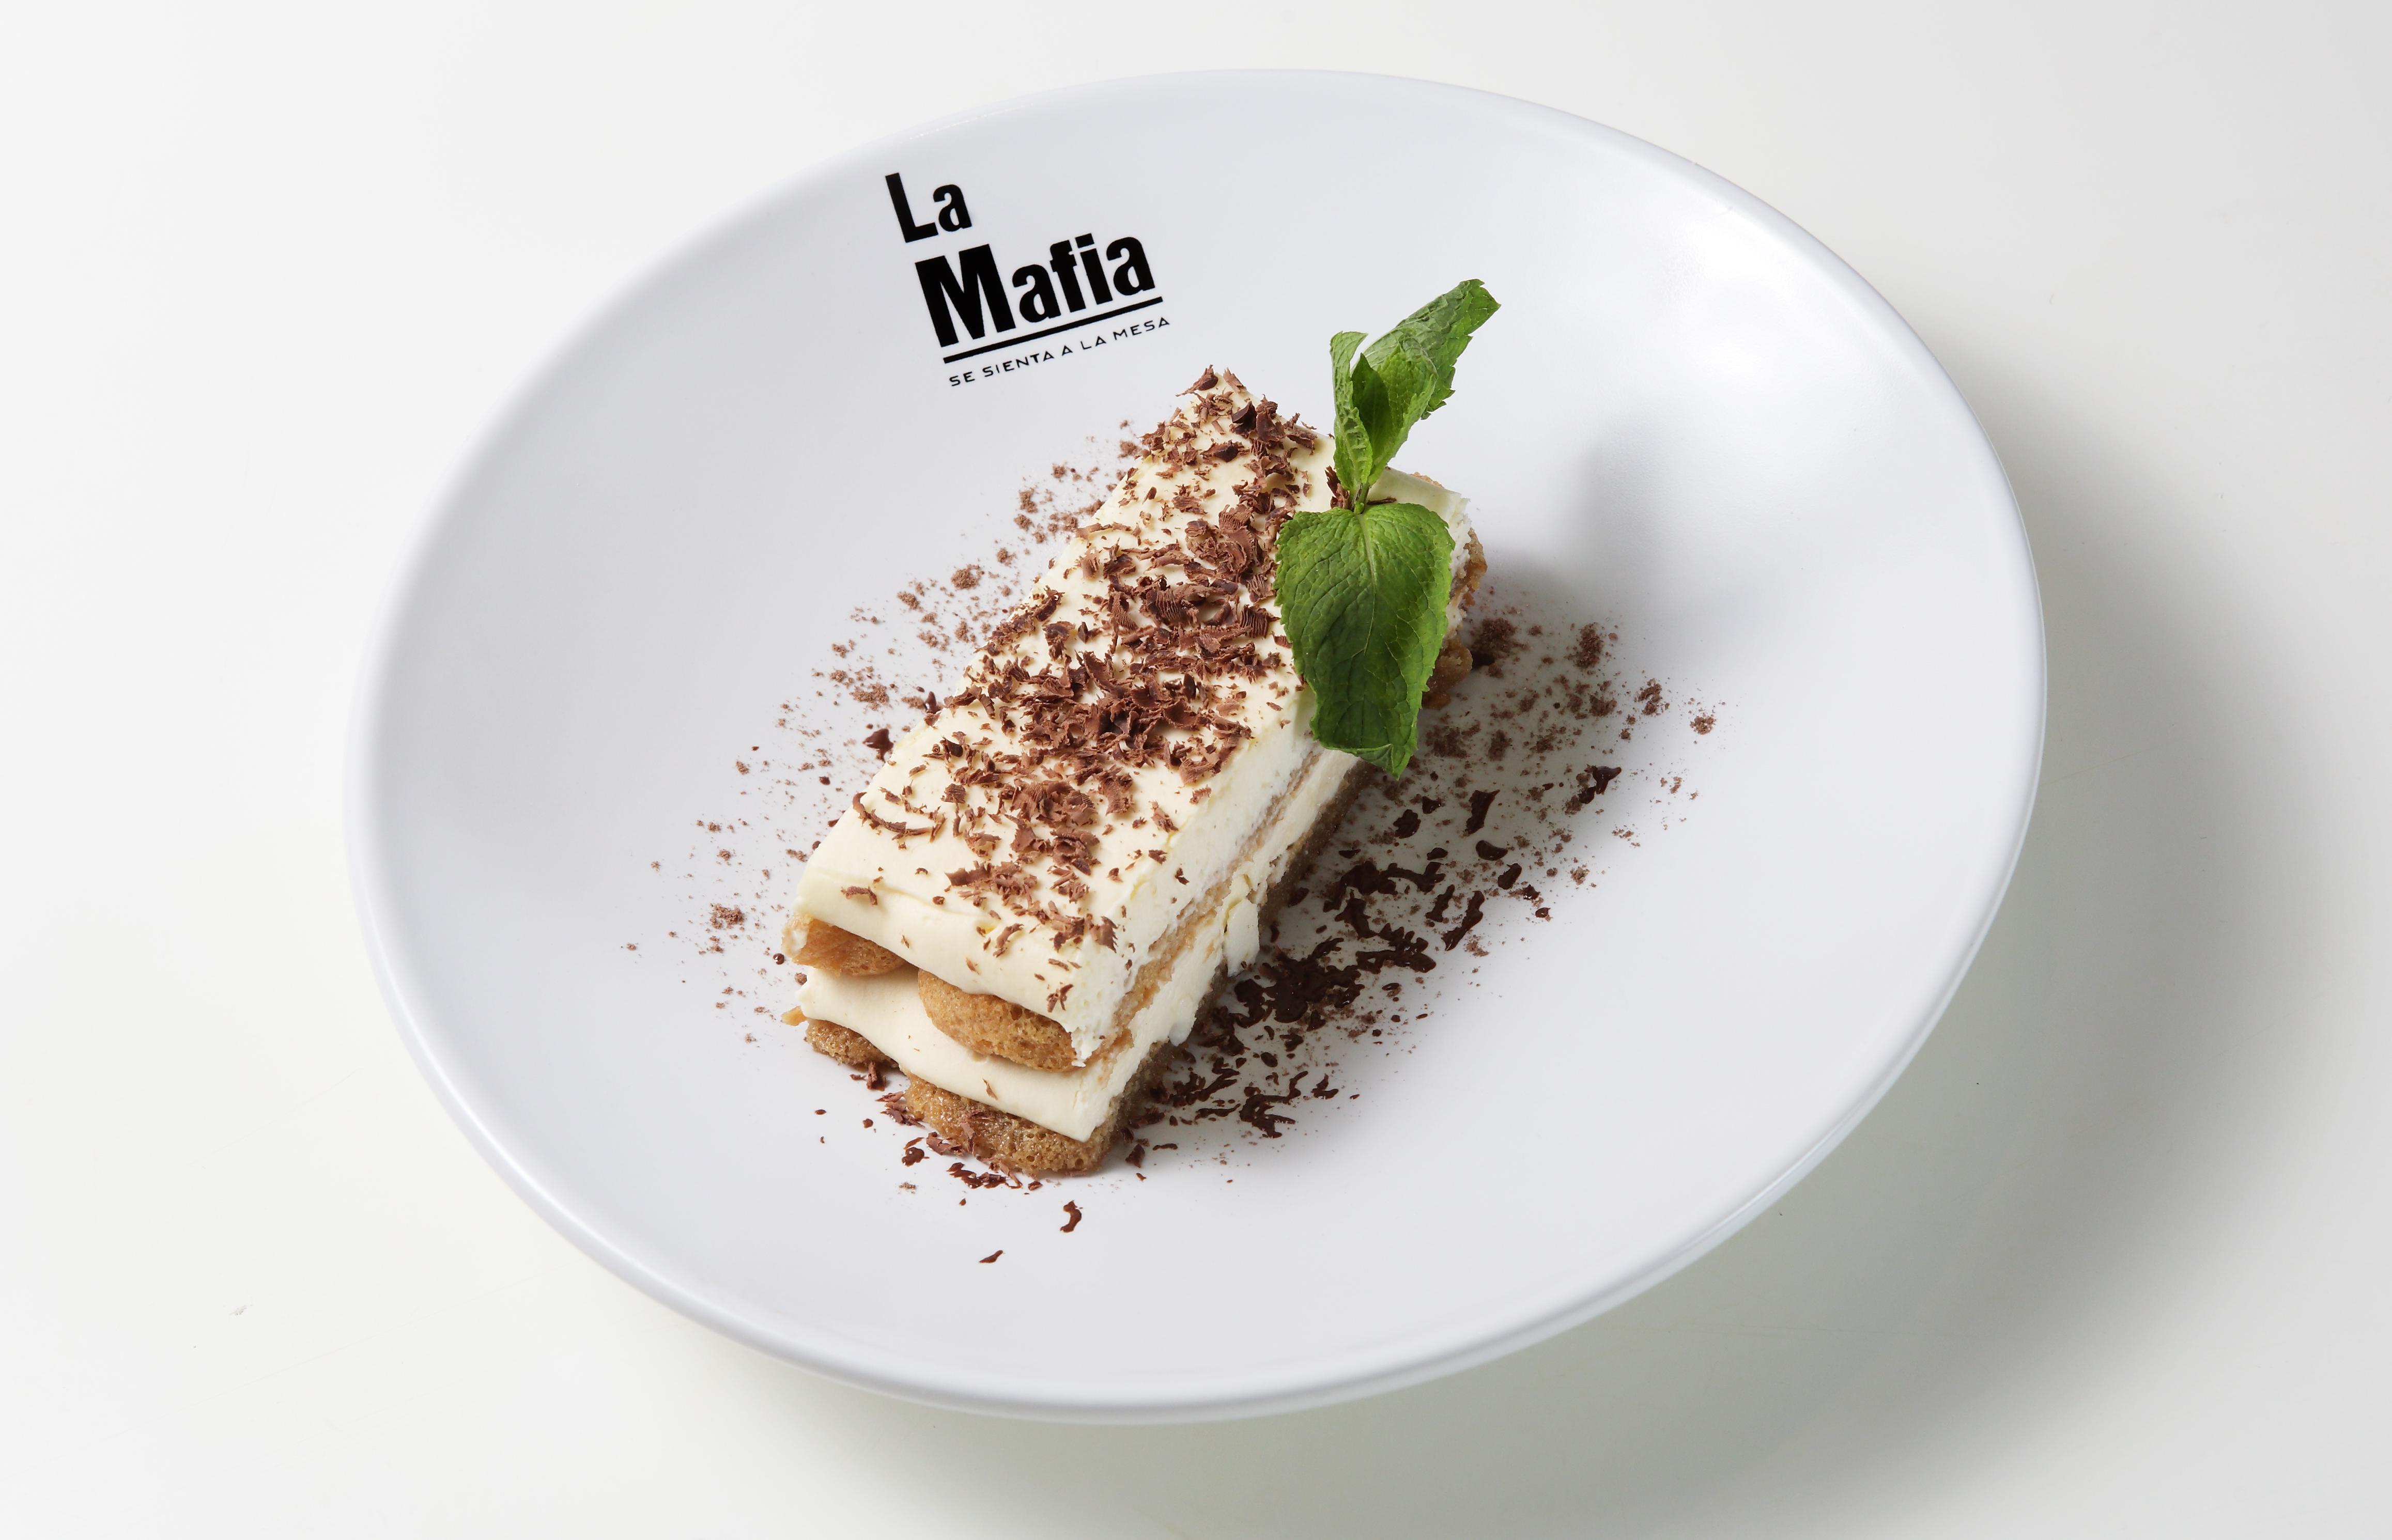 Tiramisú de La Mafia se sienta a la mesa - Mascarpone, toda la cremosidad de Lombardía